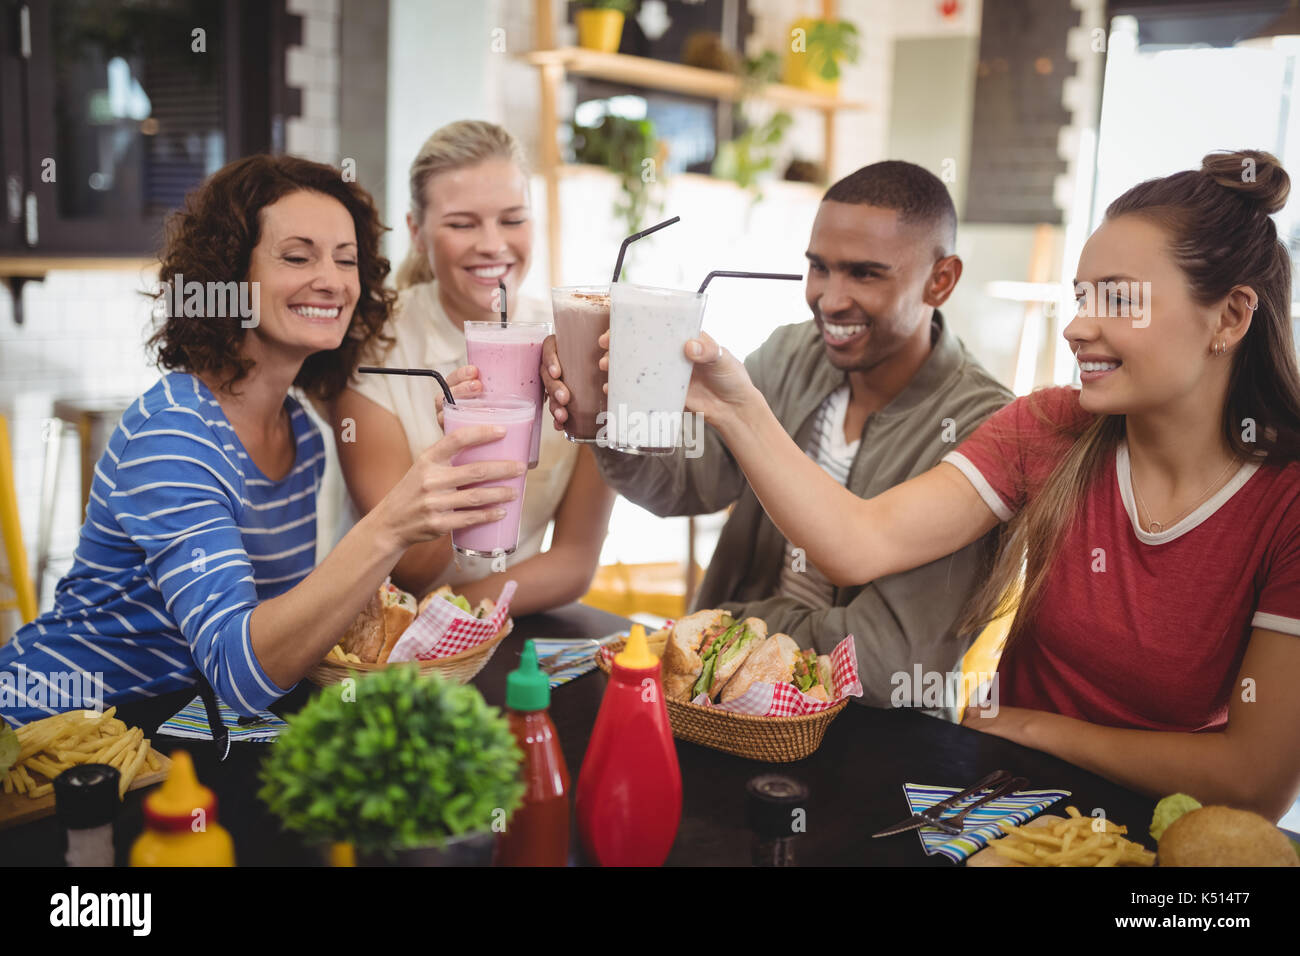 Happy friends raising boissons tout en sitting at table in coffee shop Banque D'Images